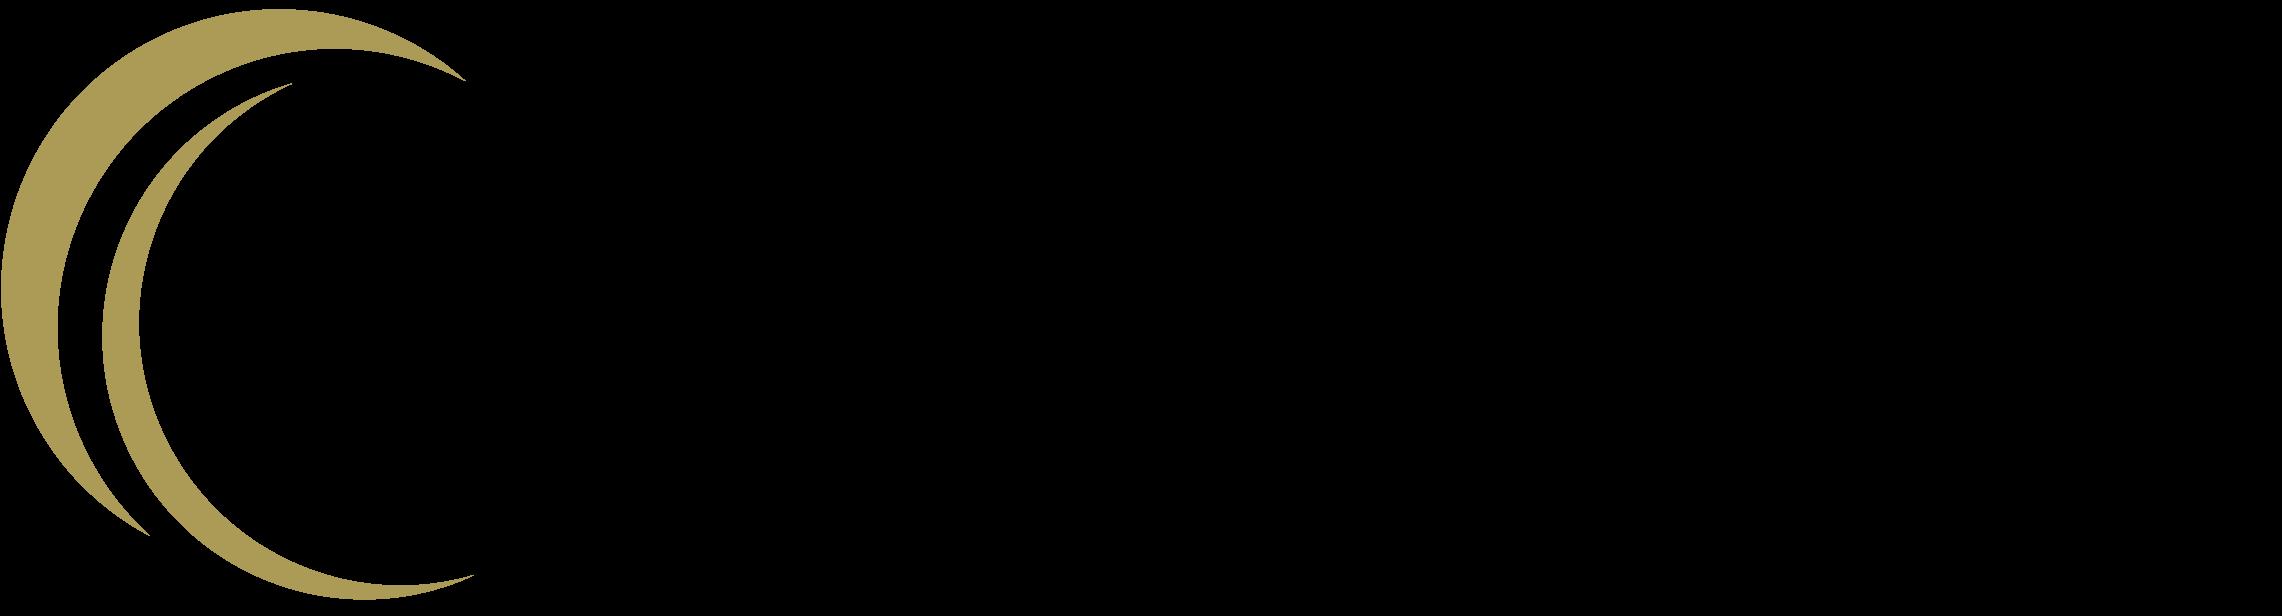 HYPRO-F® Logo